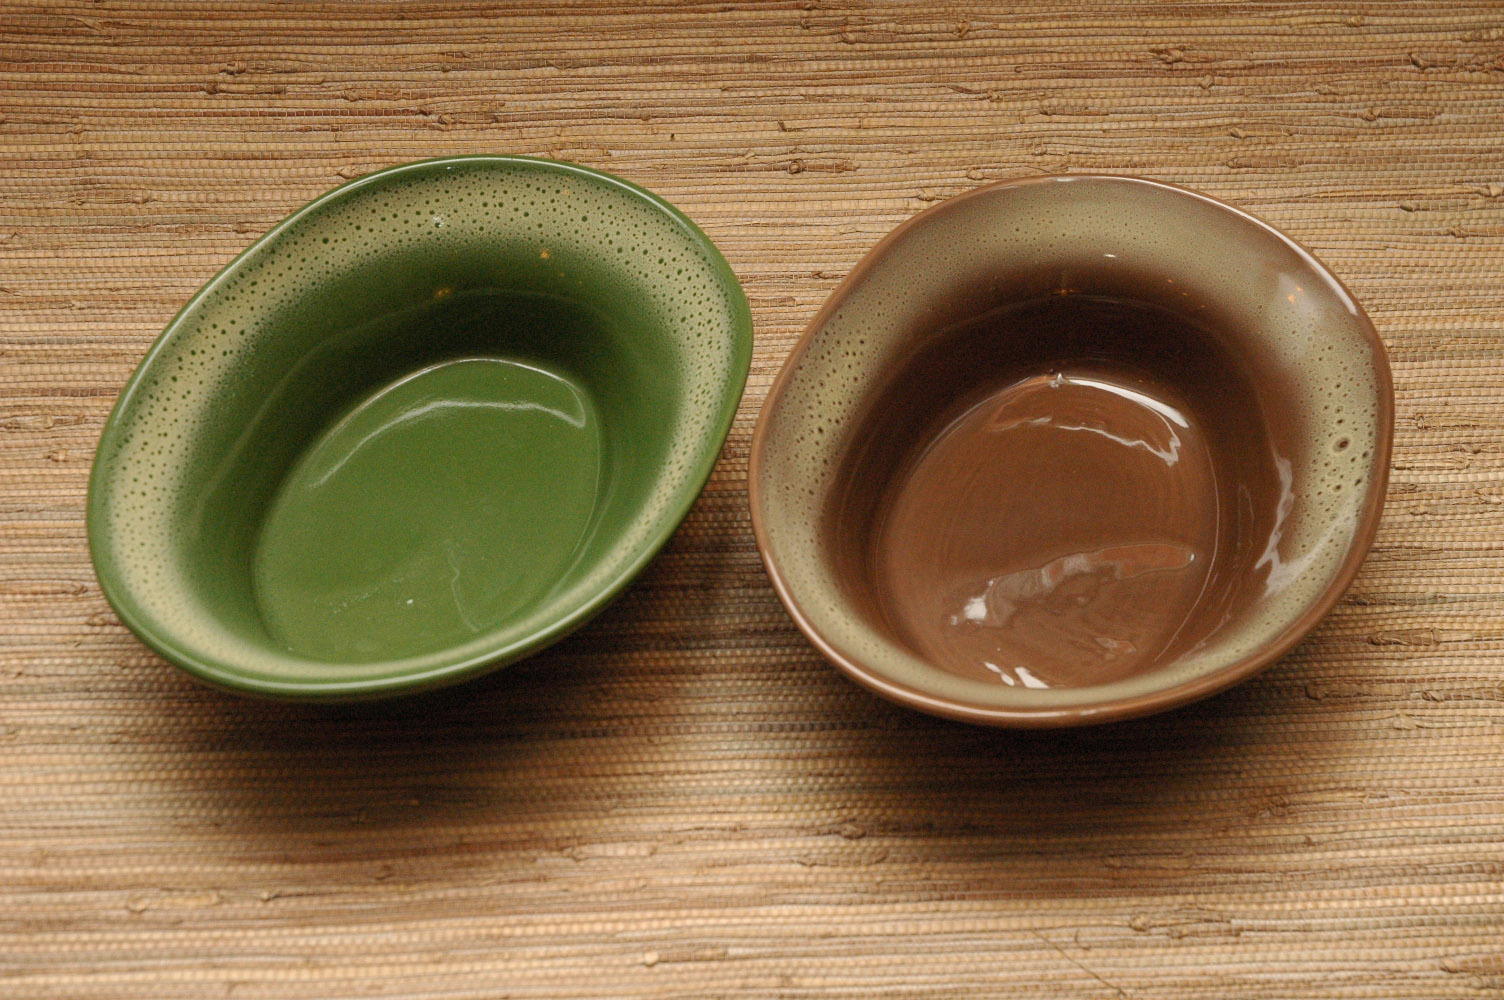 Tamac oval bowls